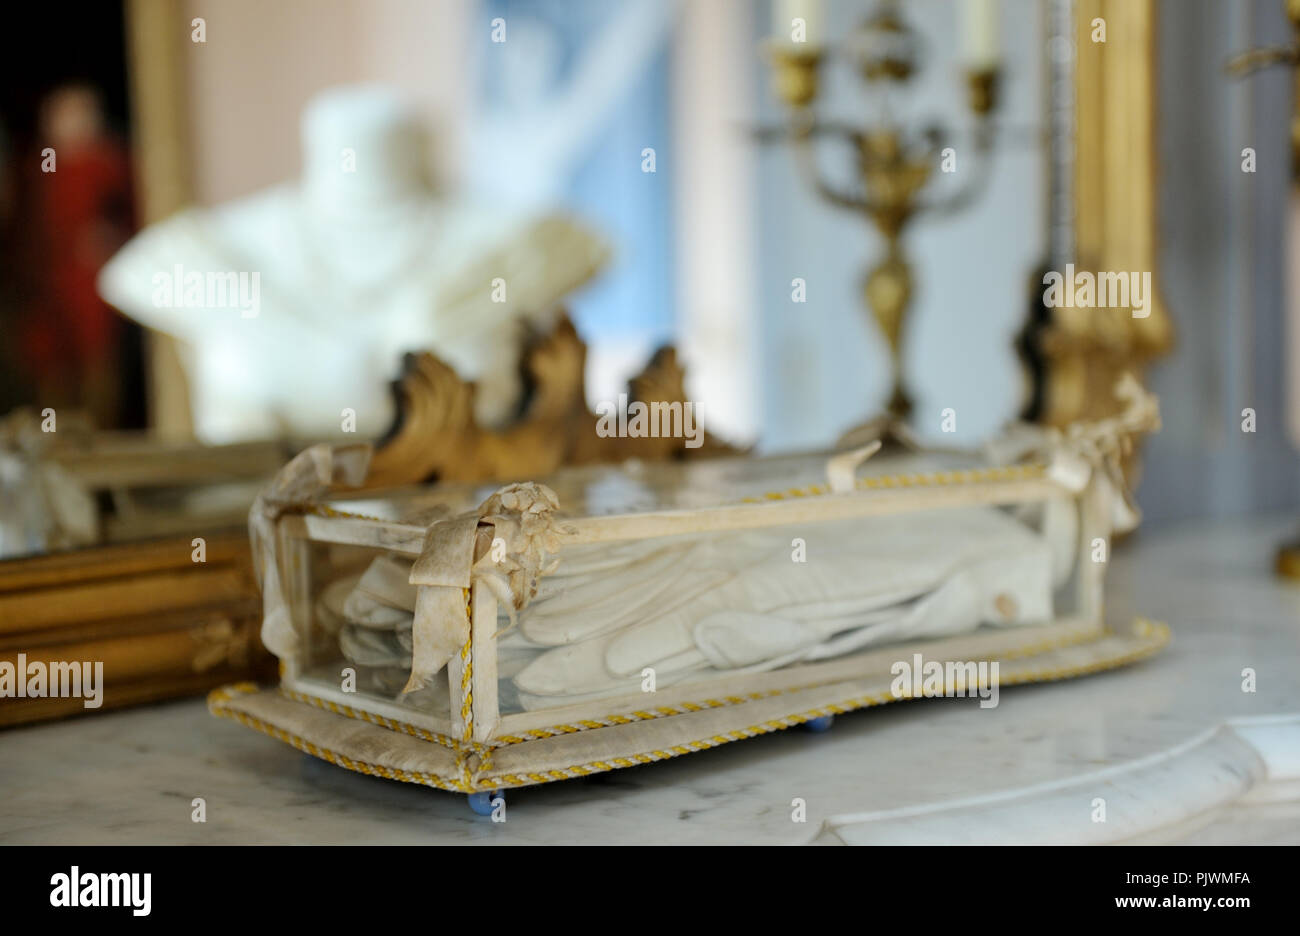 Interieur van kasteel stock photos & interieur van kasteel stock